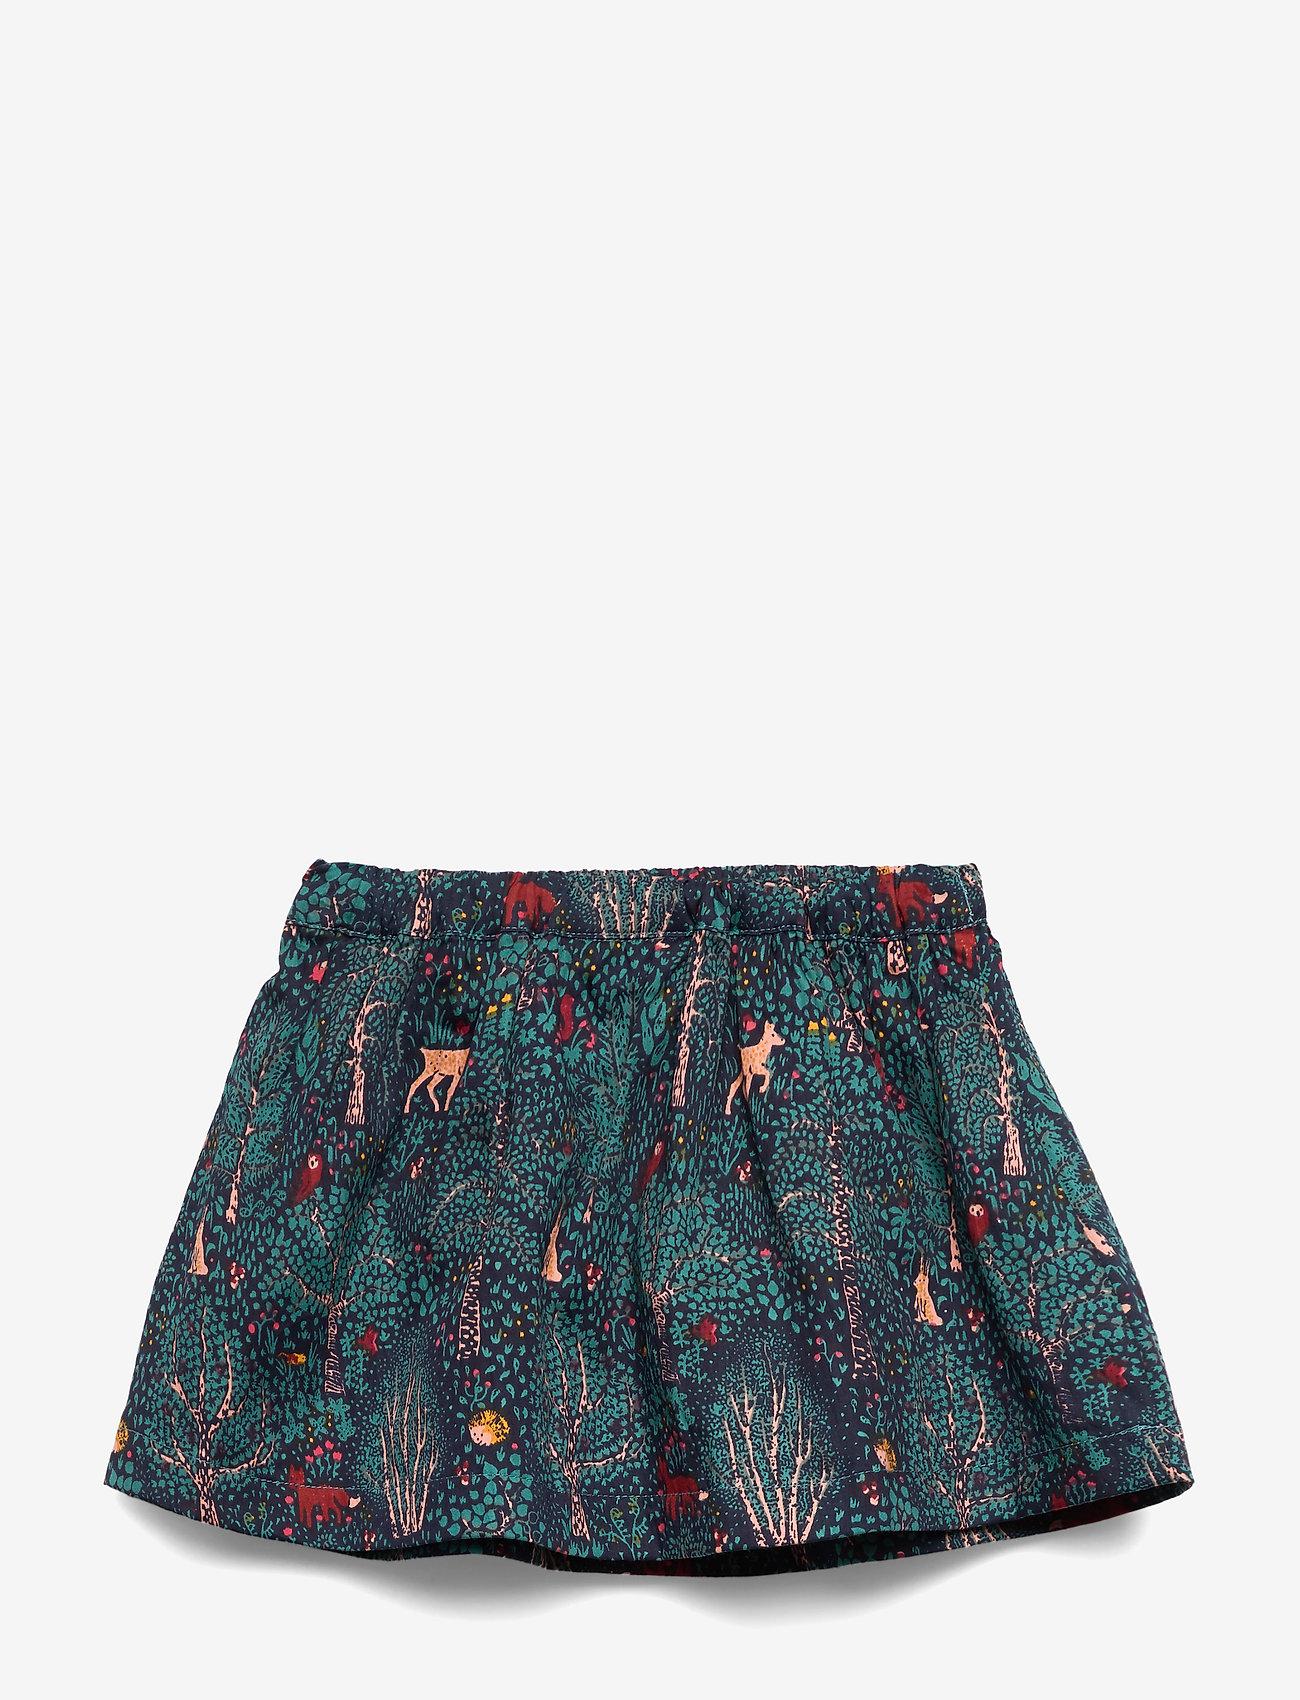 Noa Noa Miniature - Skirt - rokjes - hydro - 1